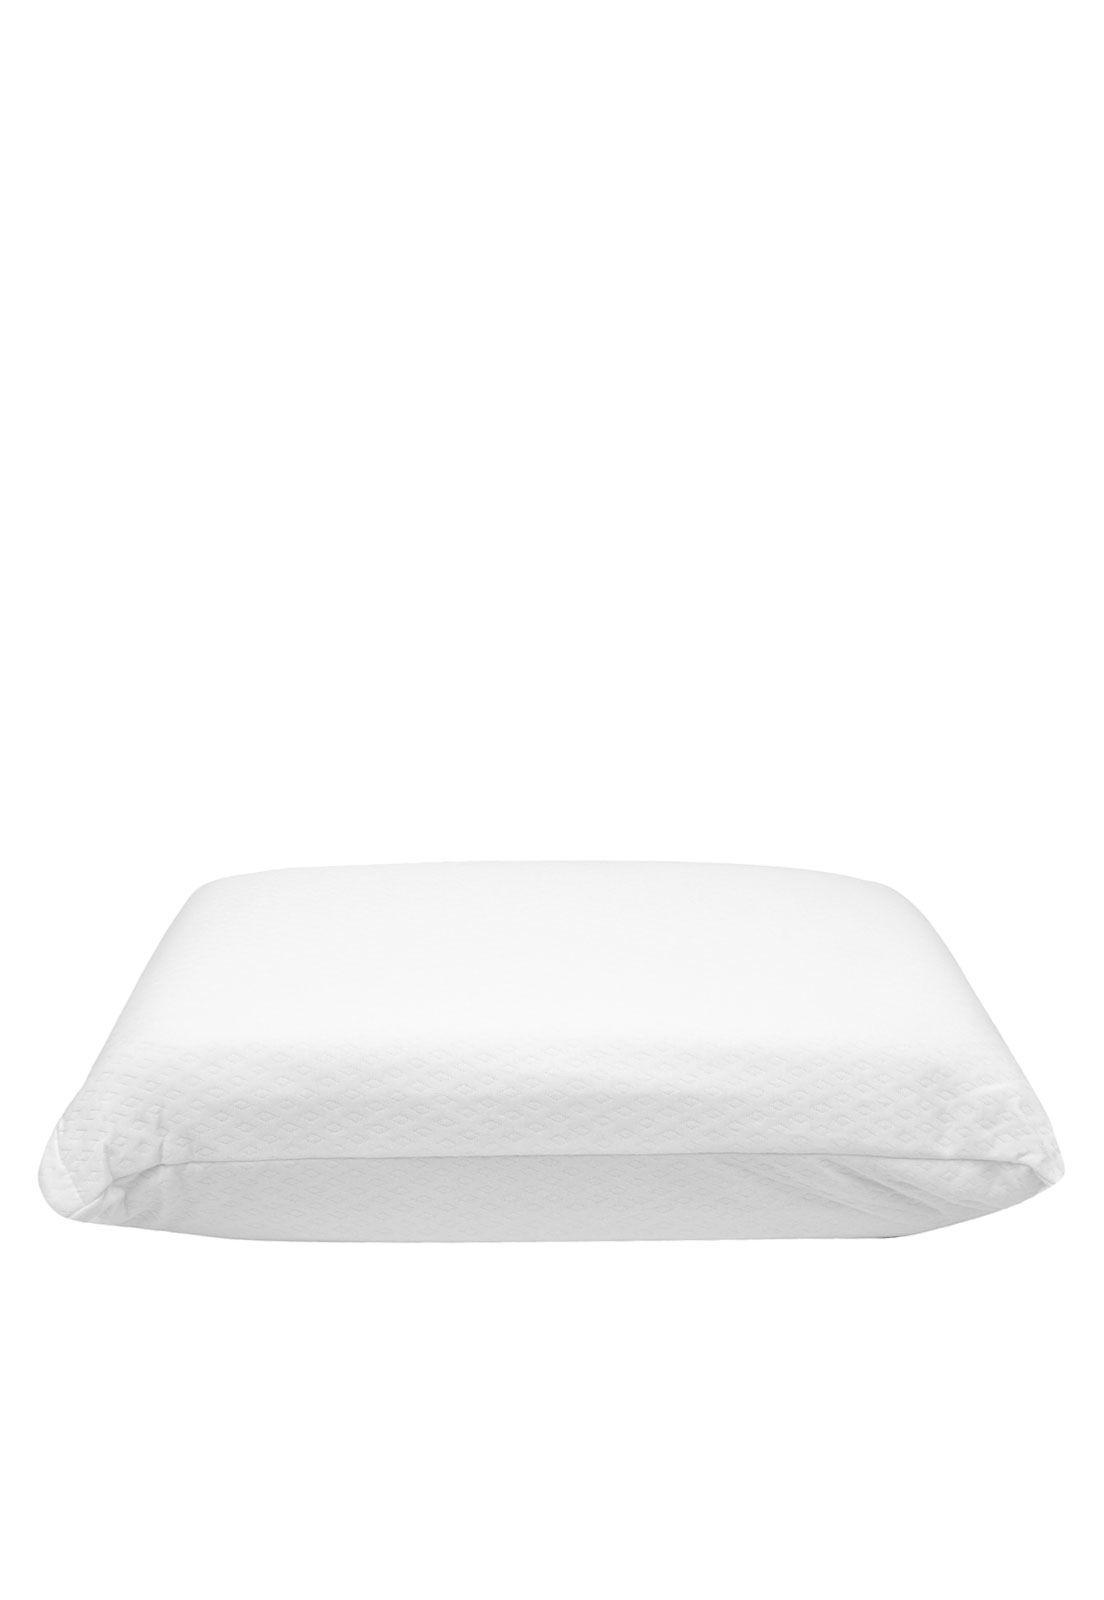 Travesseiro Personal Mix 3 Branco Fibrasca